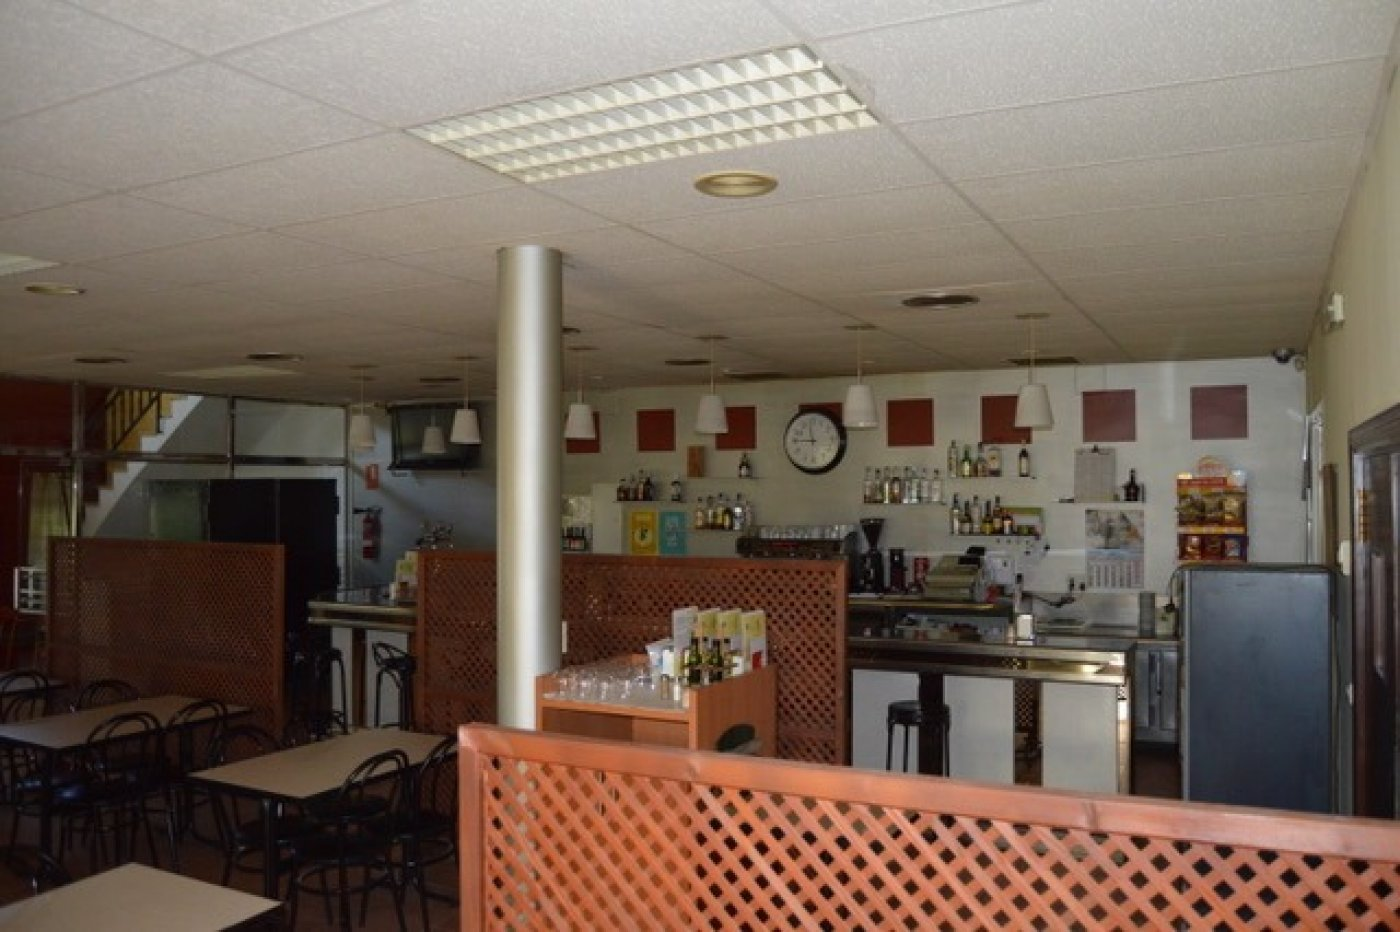 Nave restaurante en polígono cerca de sant sadurní d´anoia - imagenInmueble29